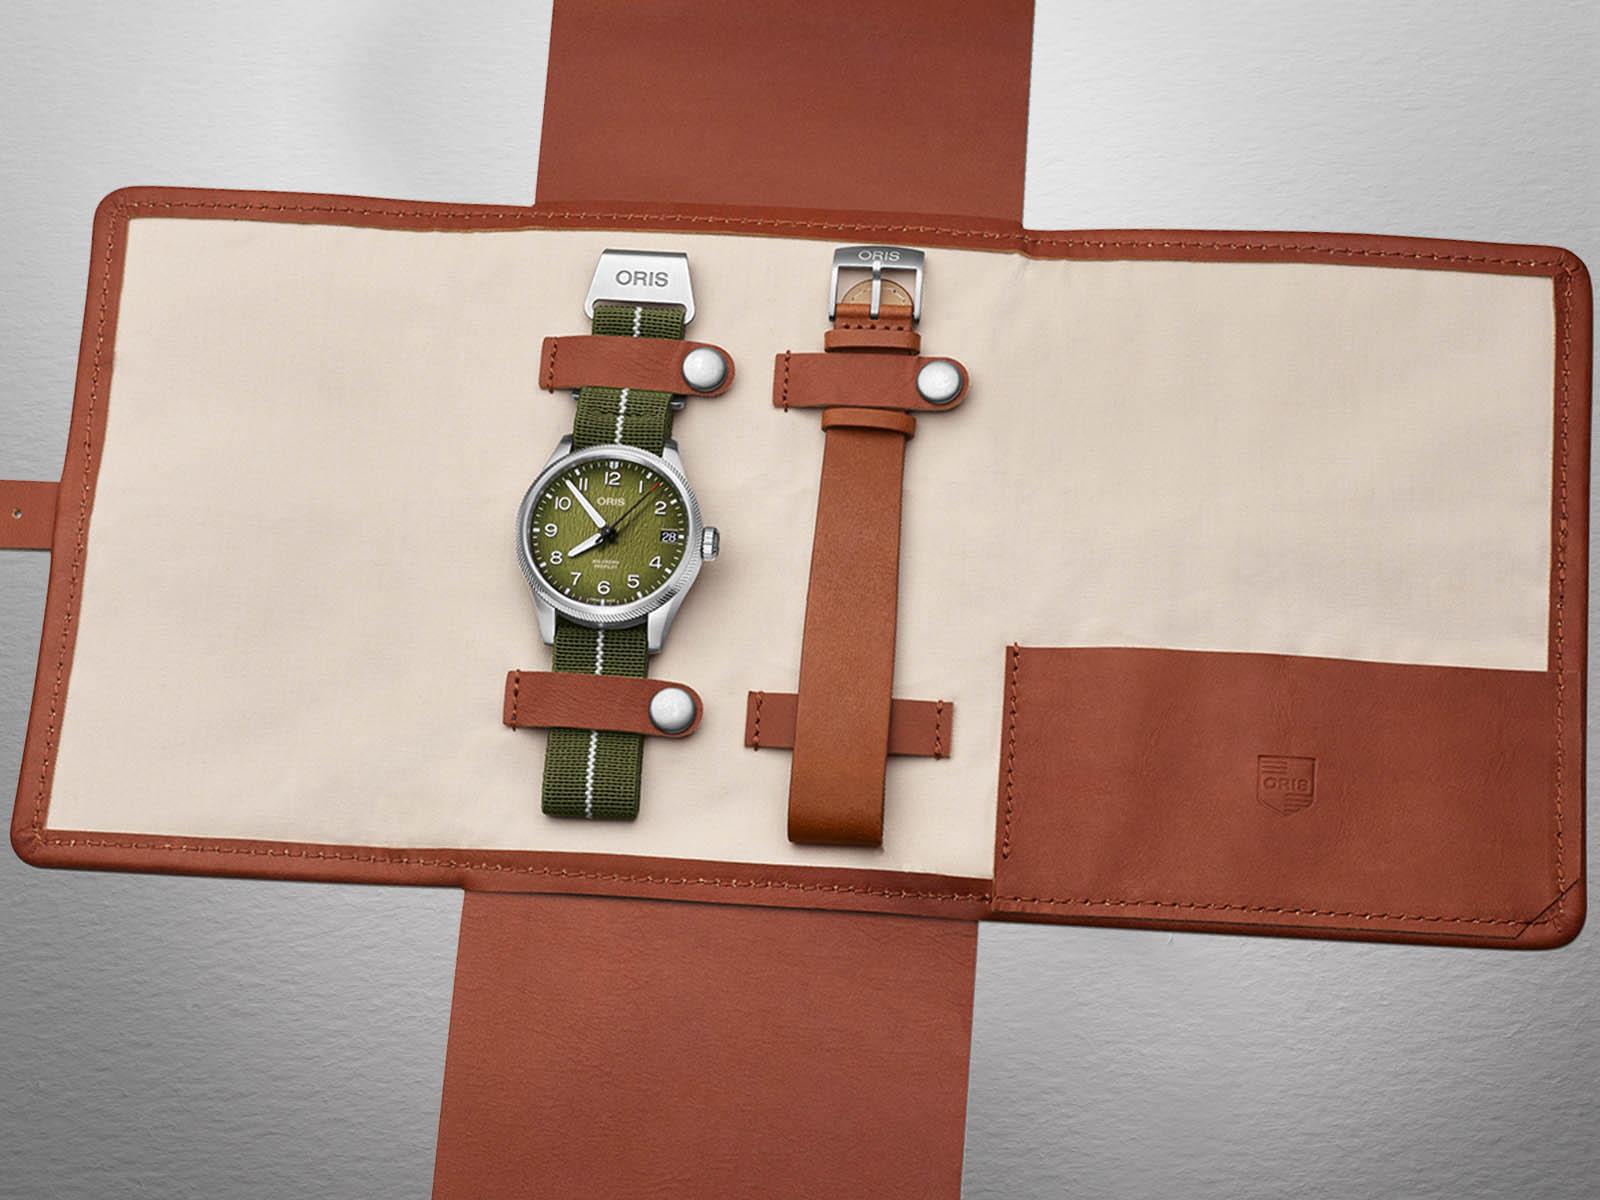 01-751-7761-4187-set-oris-big-crown-propilot-okavango-air-rescue-limited-edition-9.jpg